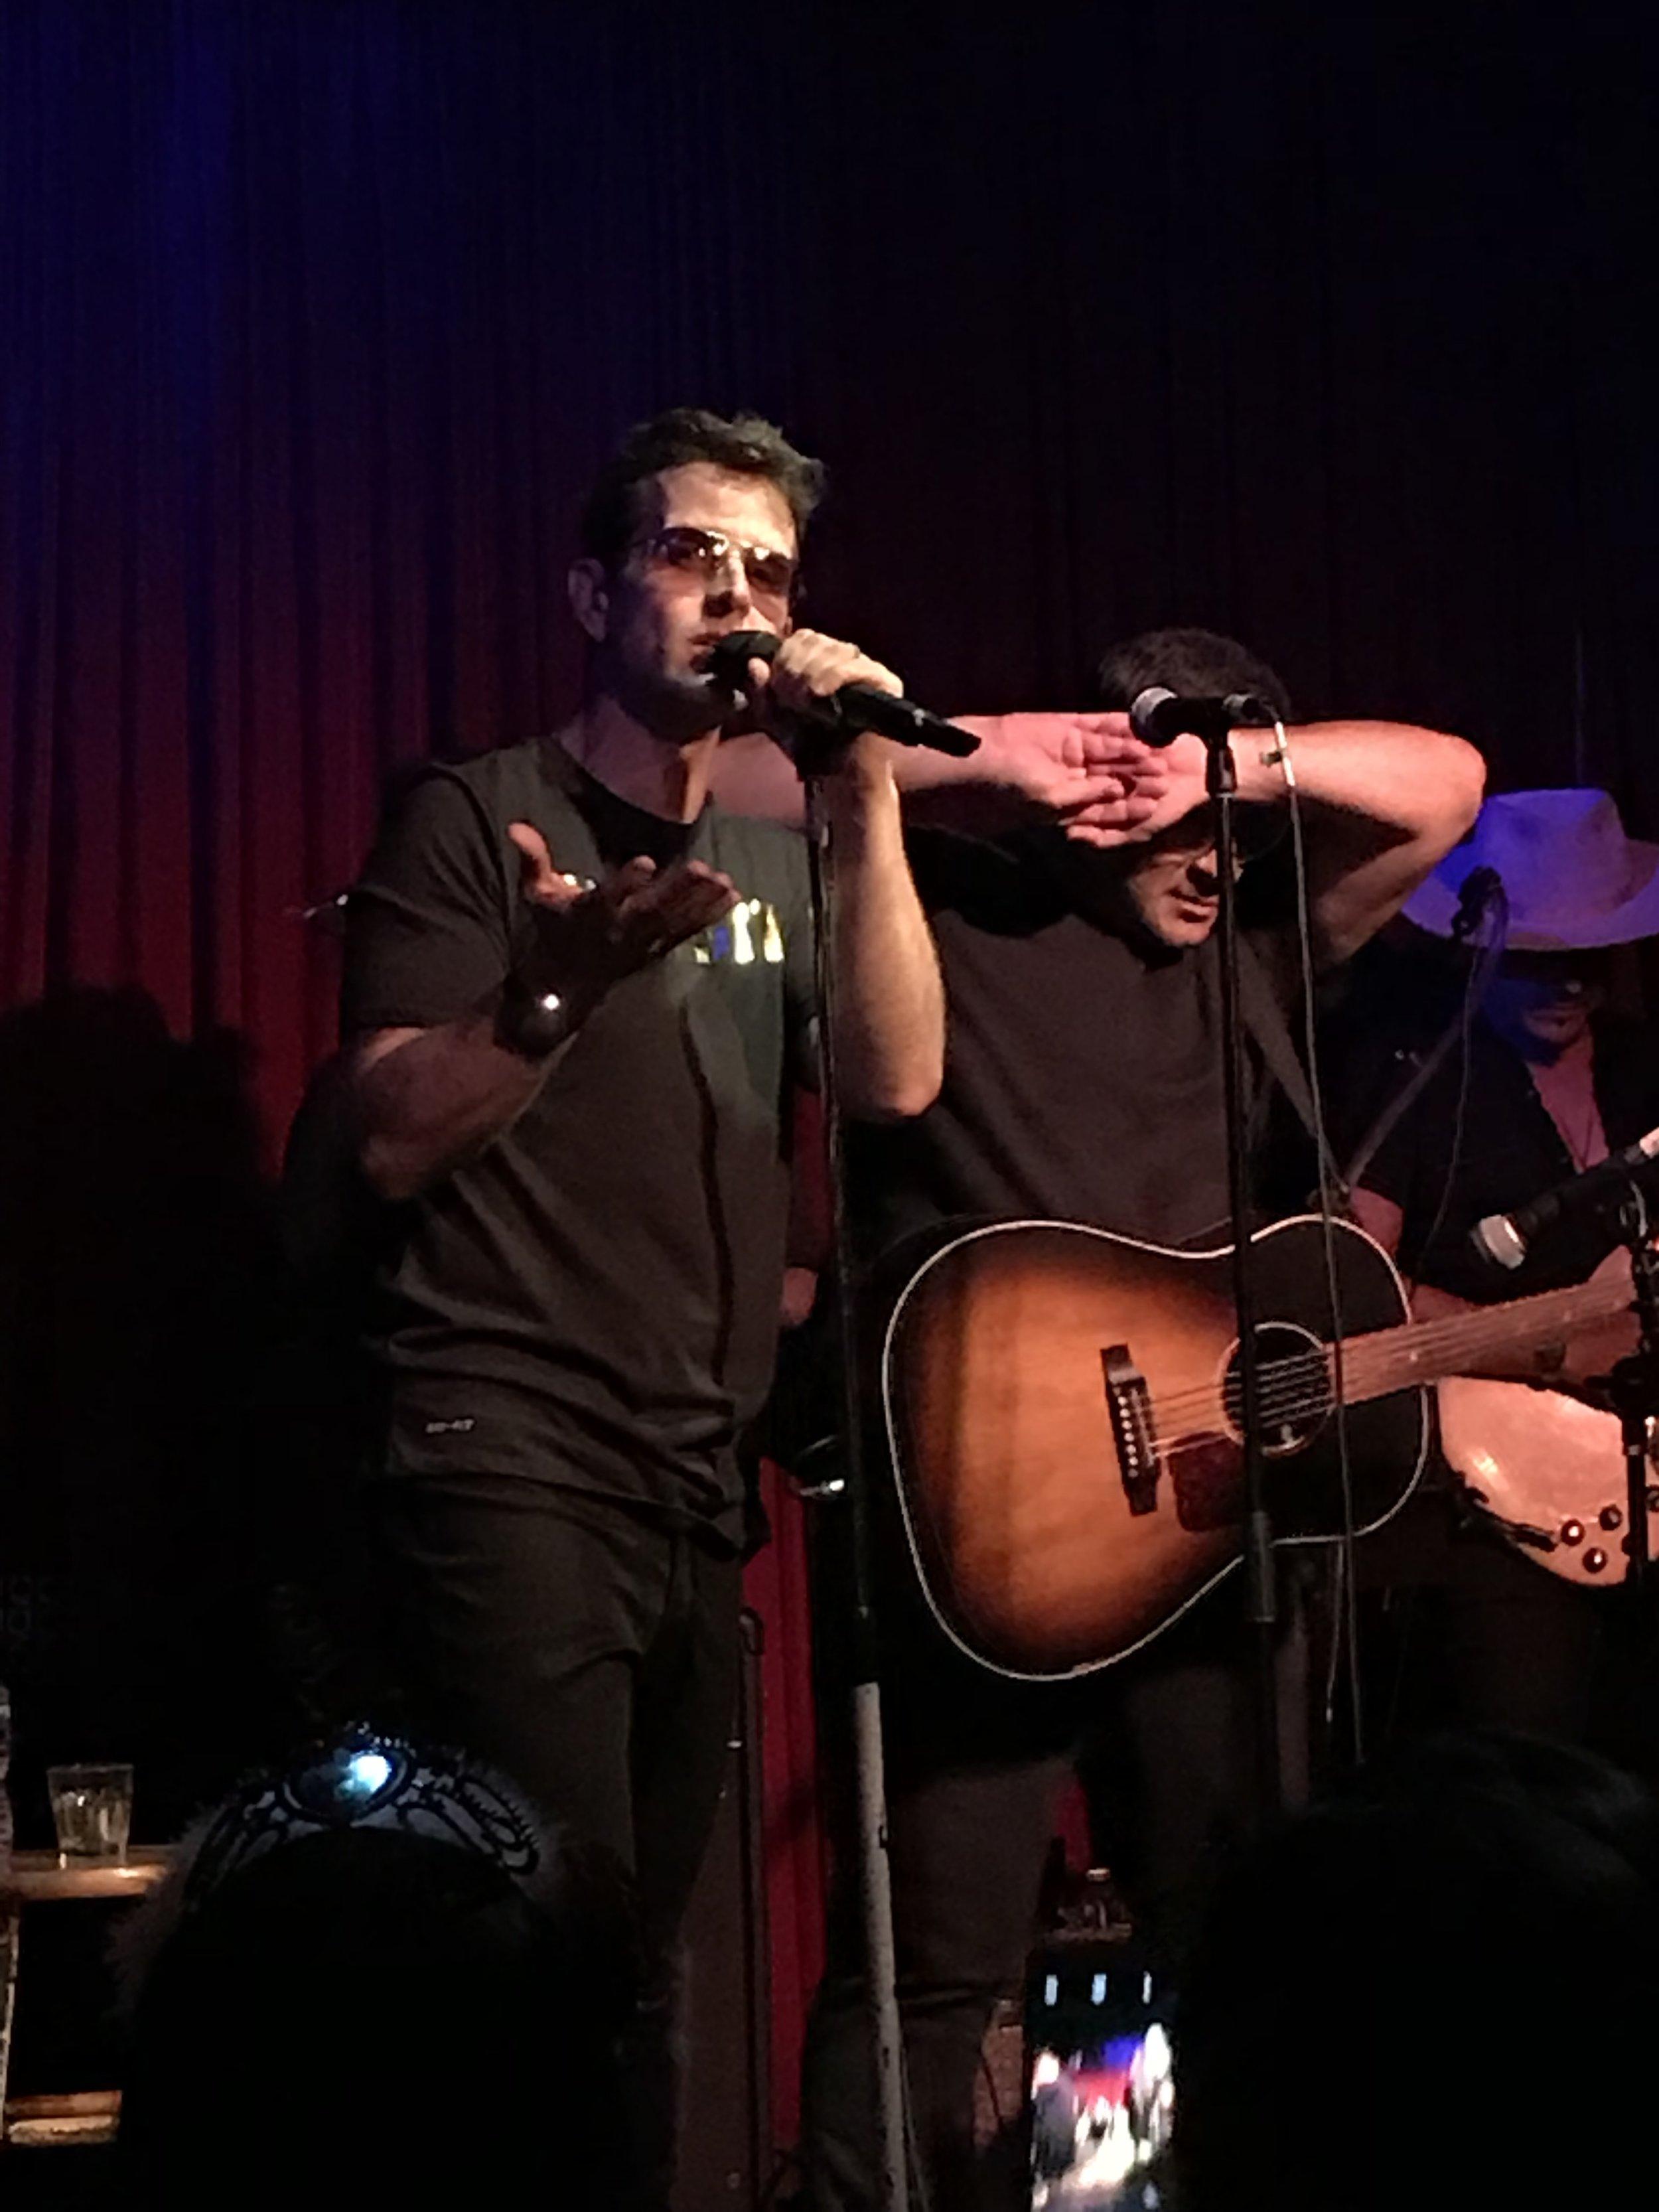 Joey McIntyre - Hollywood Nights (Photo by Mandy)